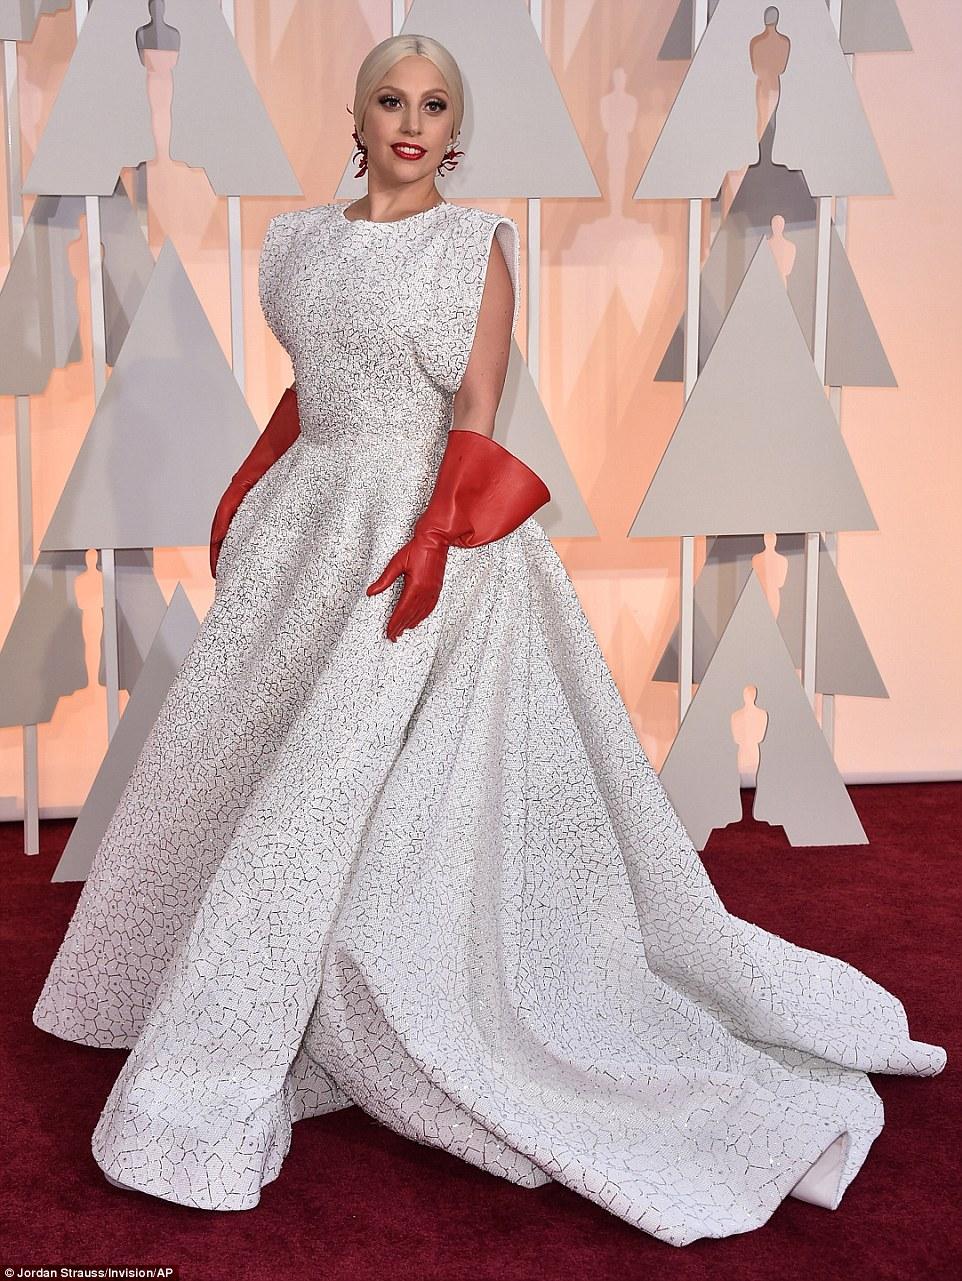 https://i2.wp.com/i.dailymail.co.uk/i/pix/2015/02/23/25F7F21600000578-2964465-Lady_Gaga_wears_three_custom_made_Azzedine_Ala_a_pieces_his_firs-a-5_1424674282991.jpg